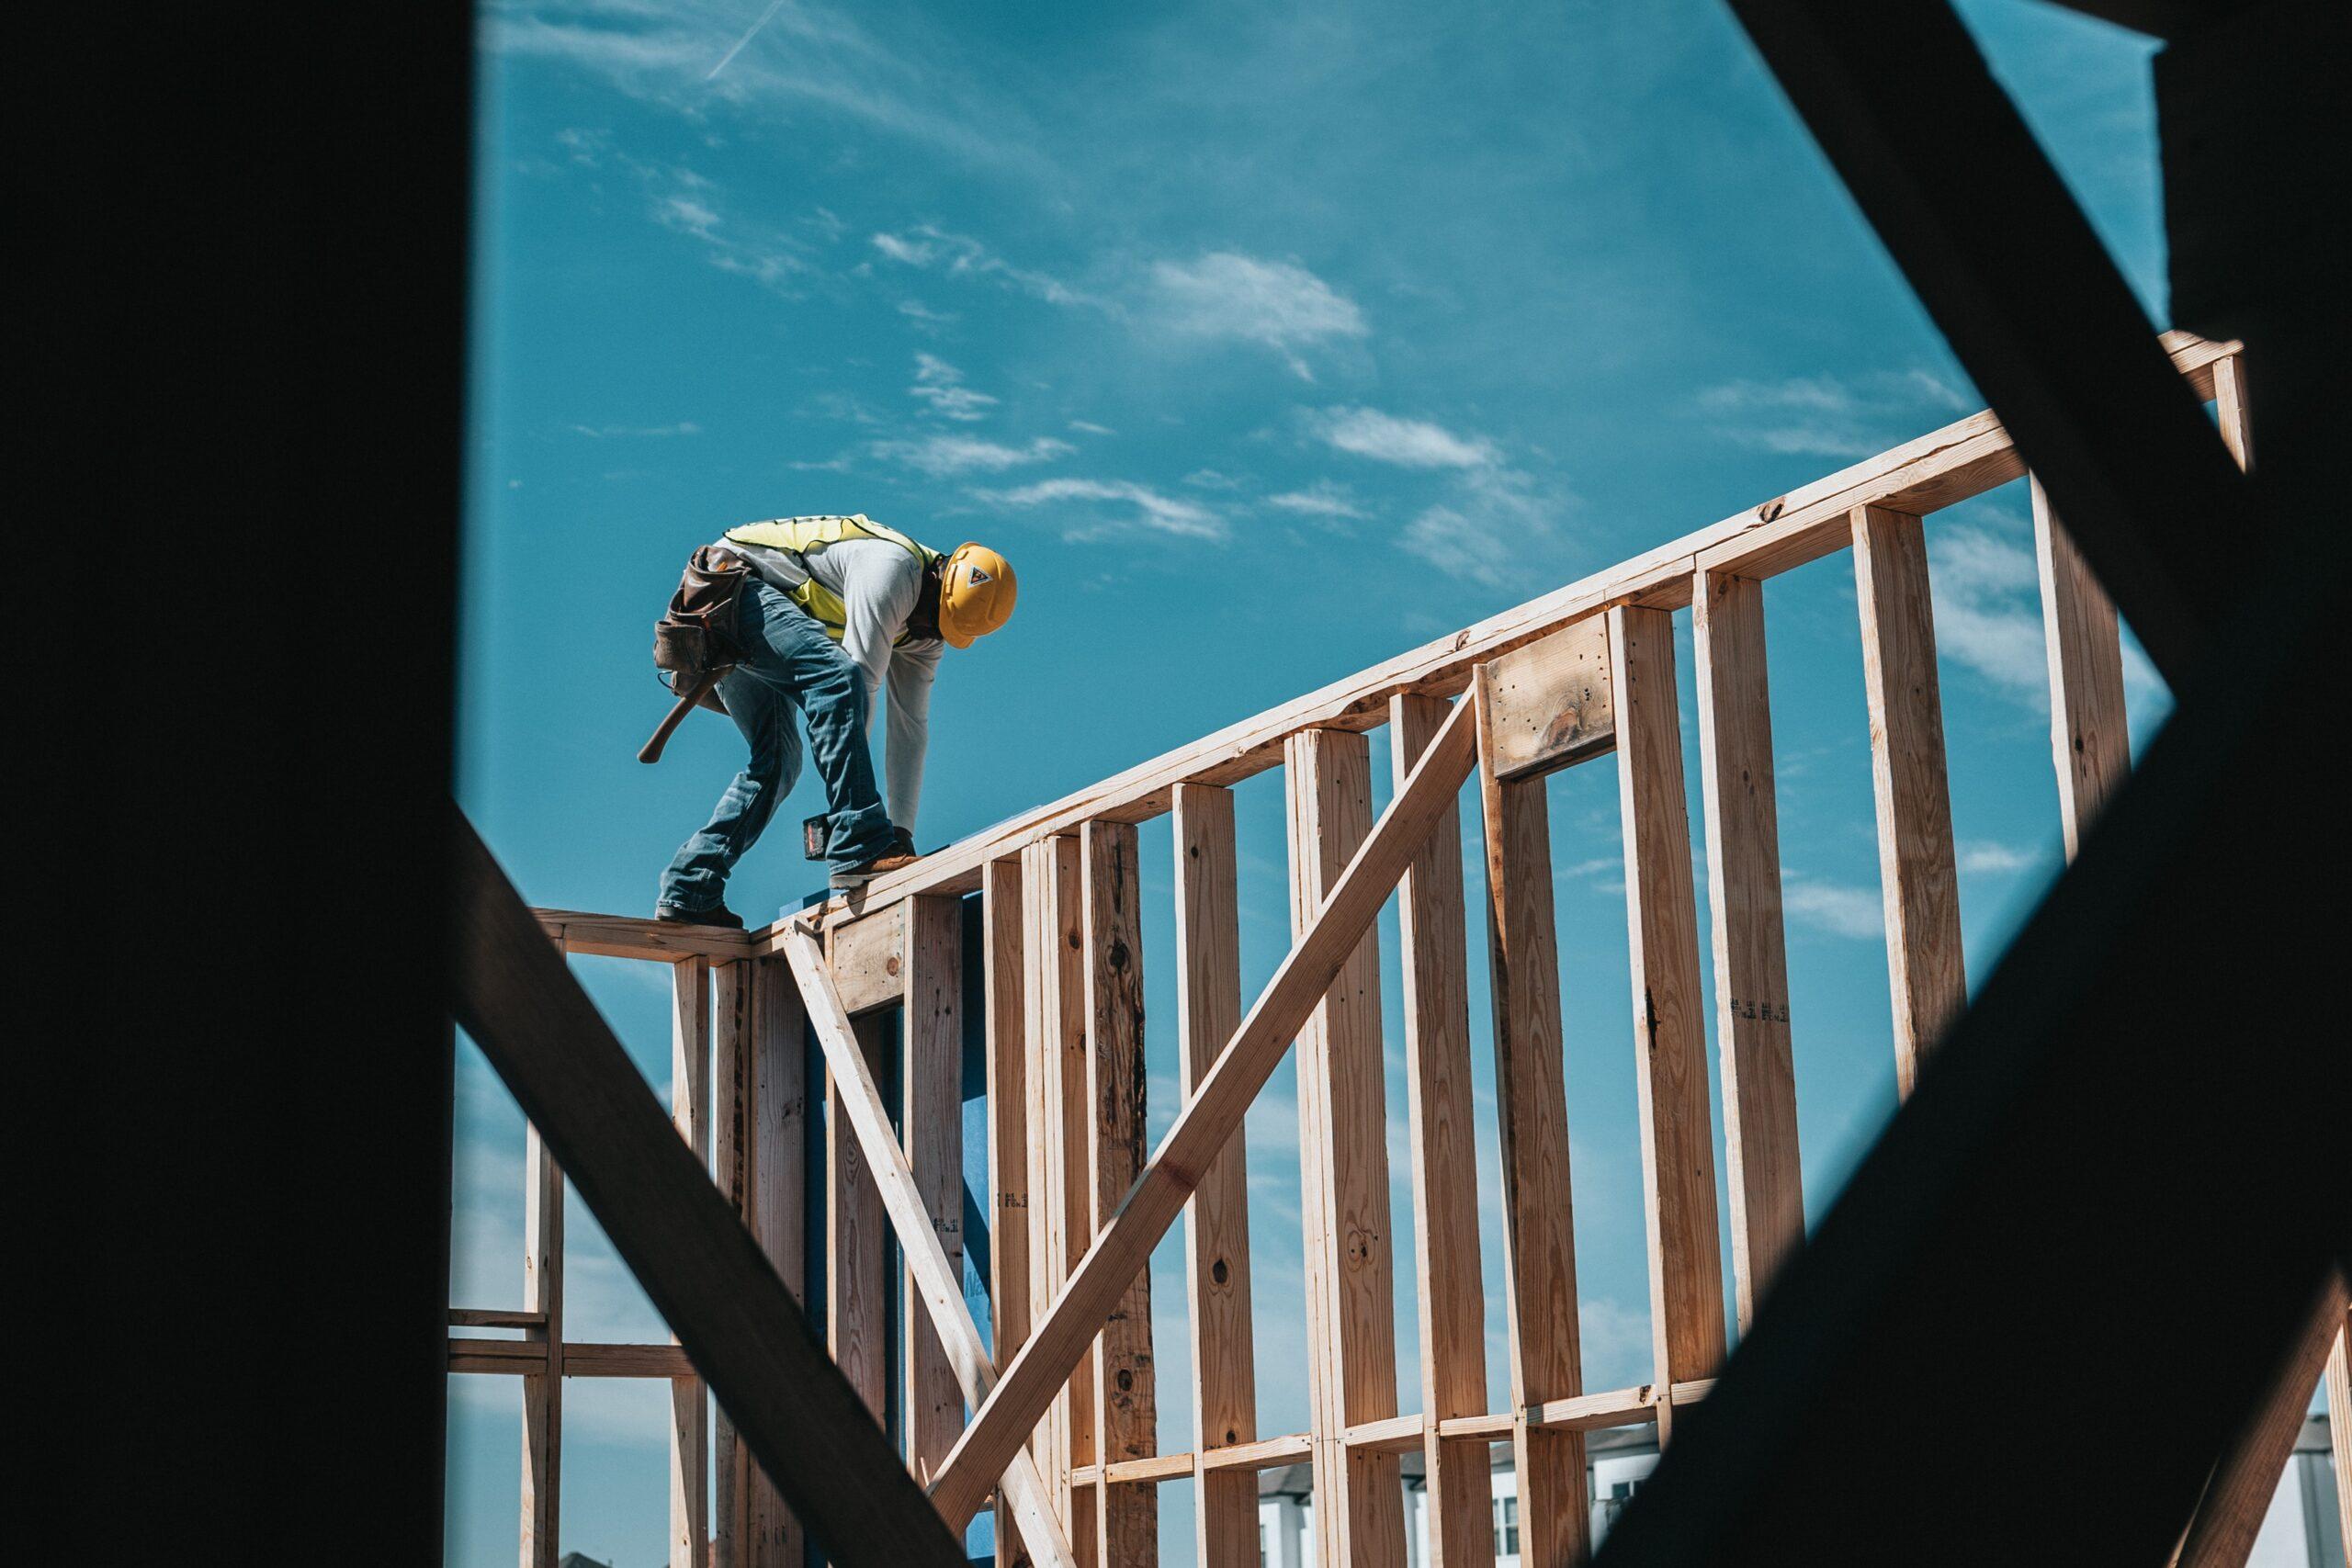 Construction Worker On Wood Building Frame